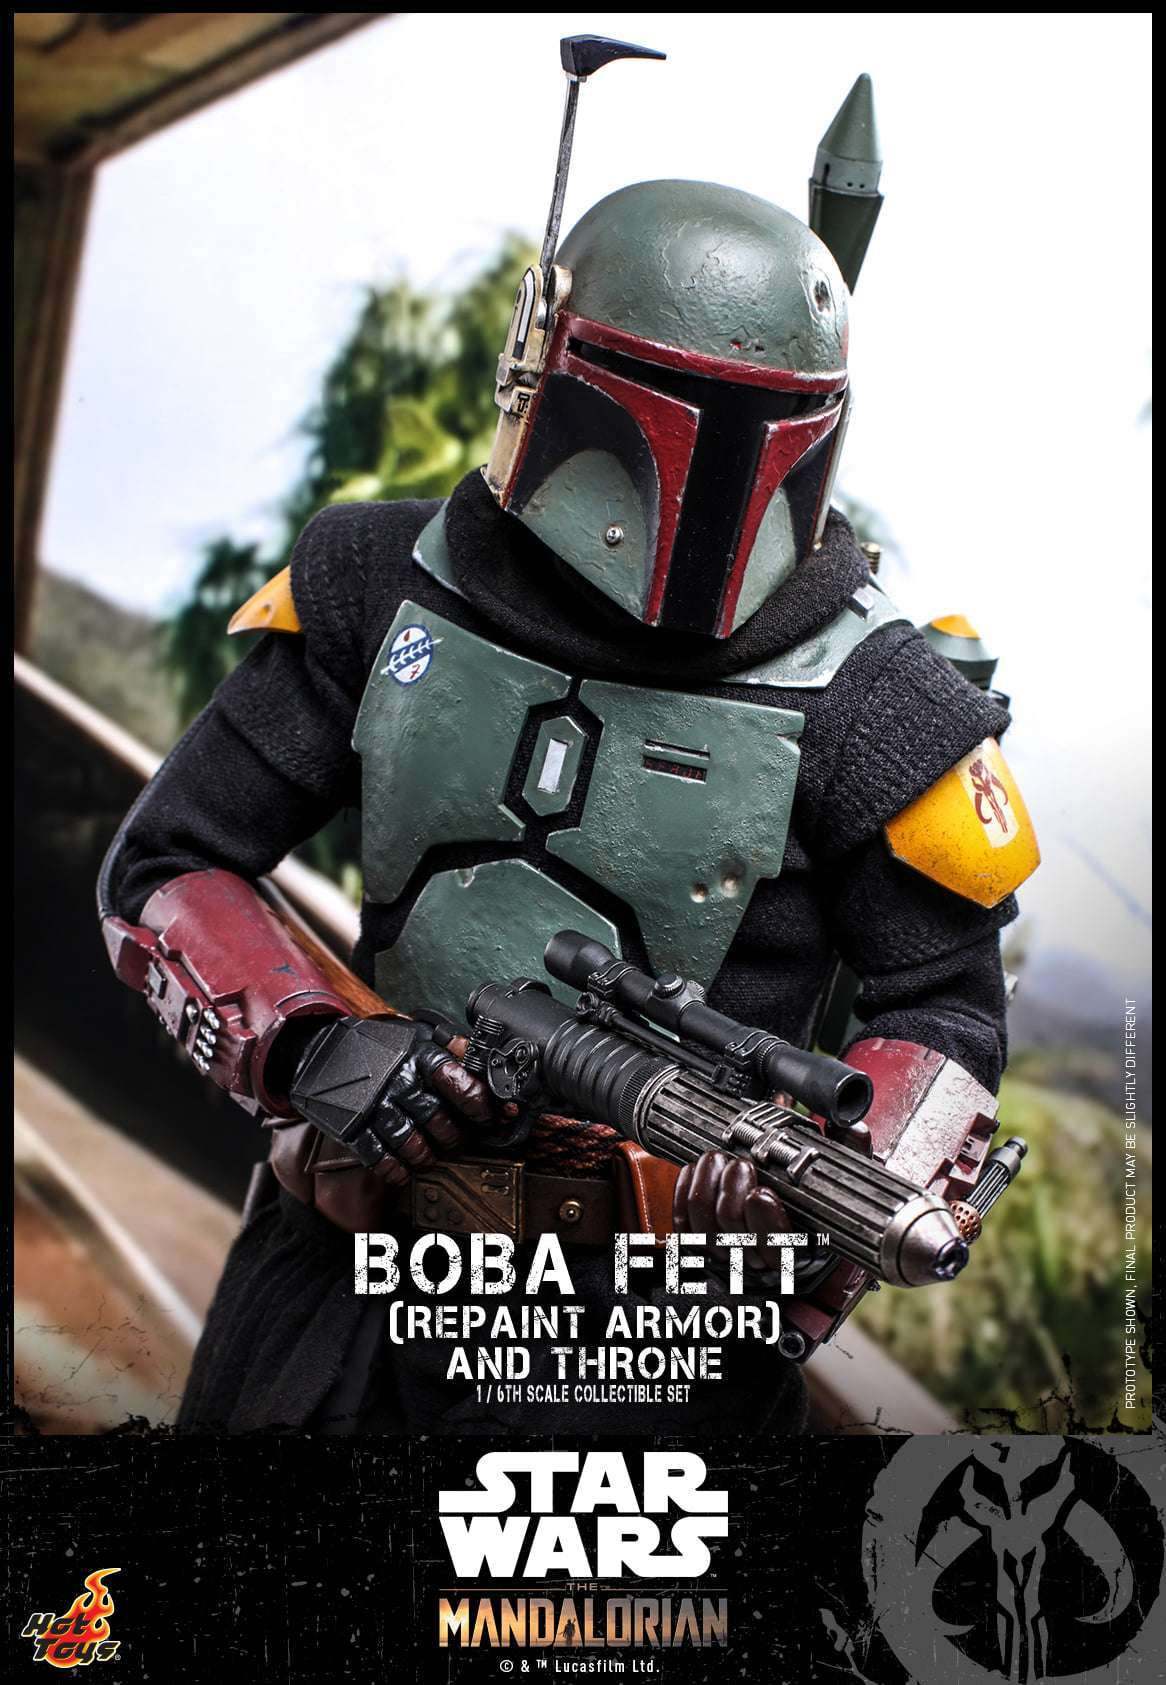 Hot-Toys-Boba-Fett-Repaint-Armor-Throne-10